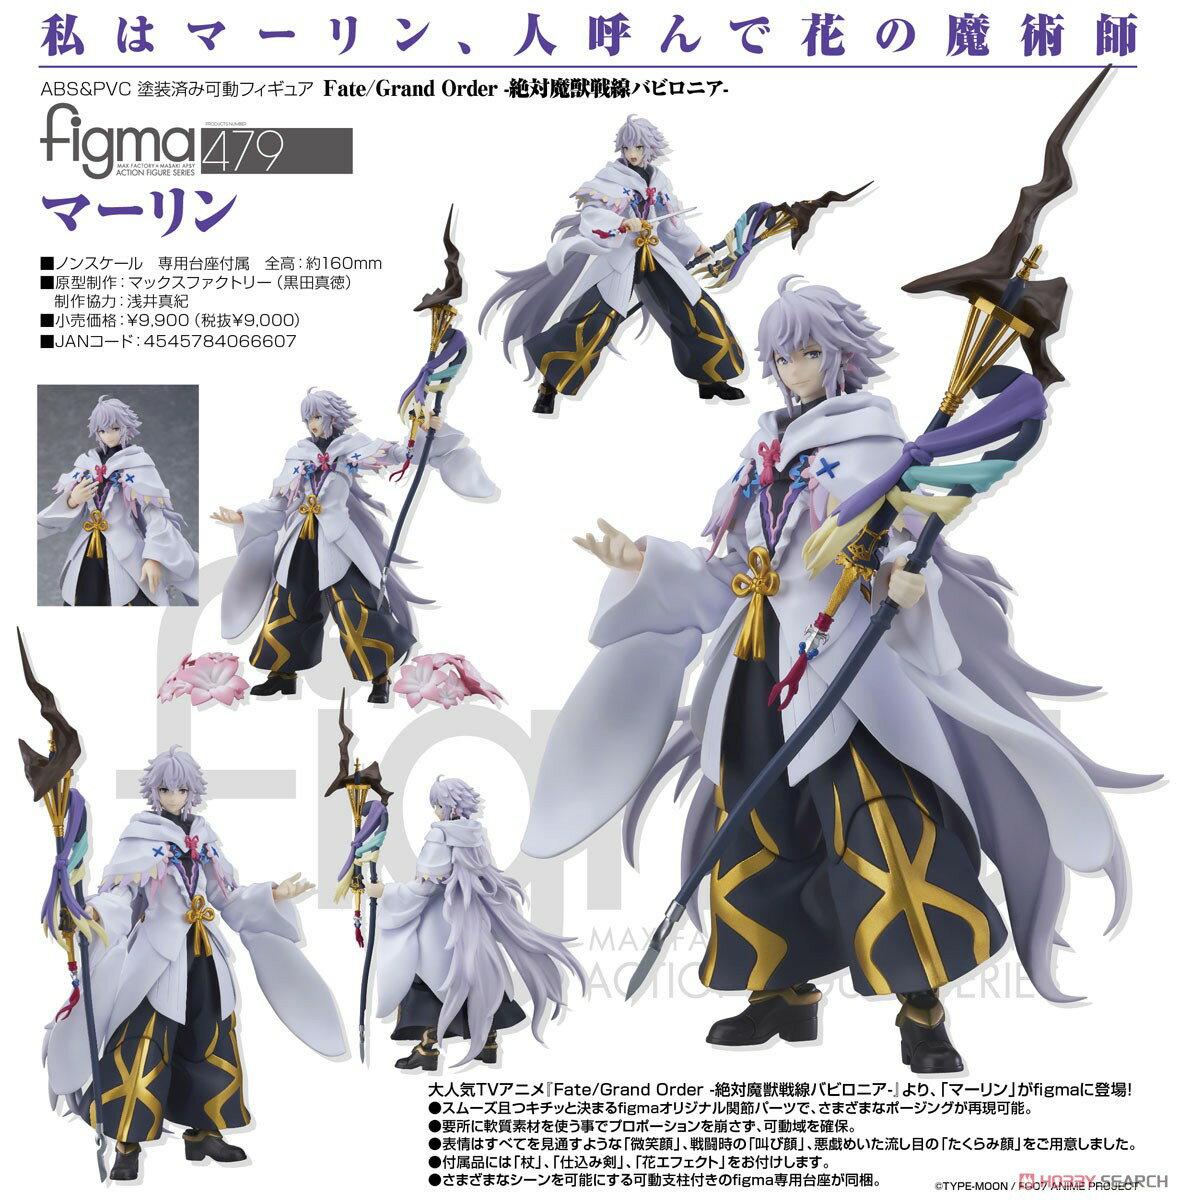 ☆勳寶玩具舖【現貨】代理版 GSC Fate/Grand Order 479 figma 梅林 Merlin